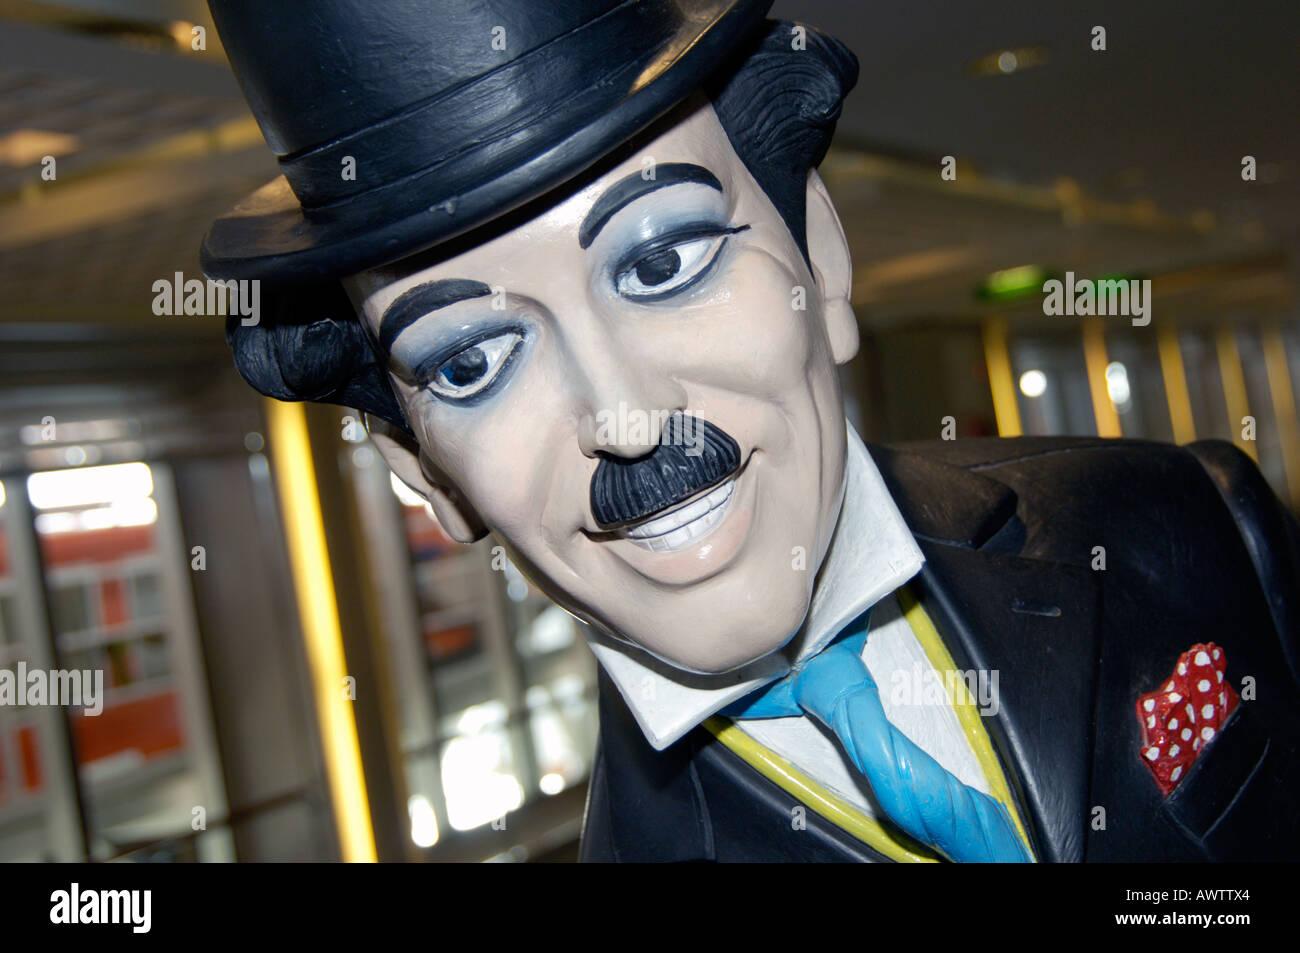 Charlie Chaplin waxwork model - Stock Image